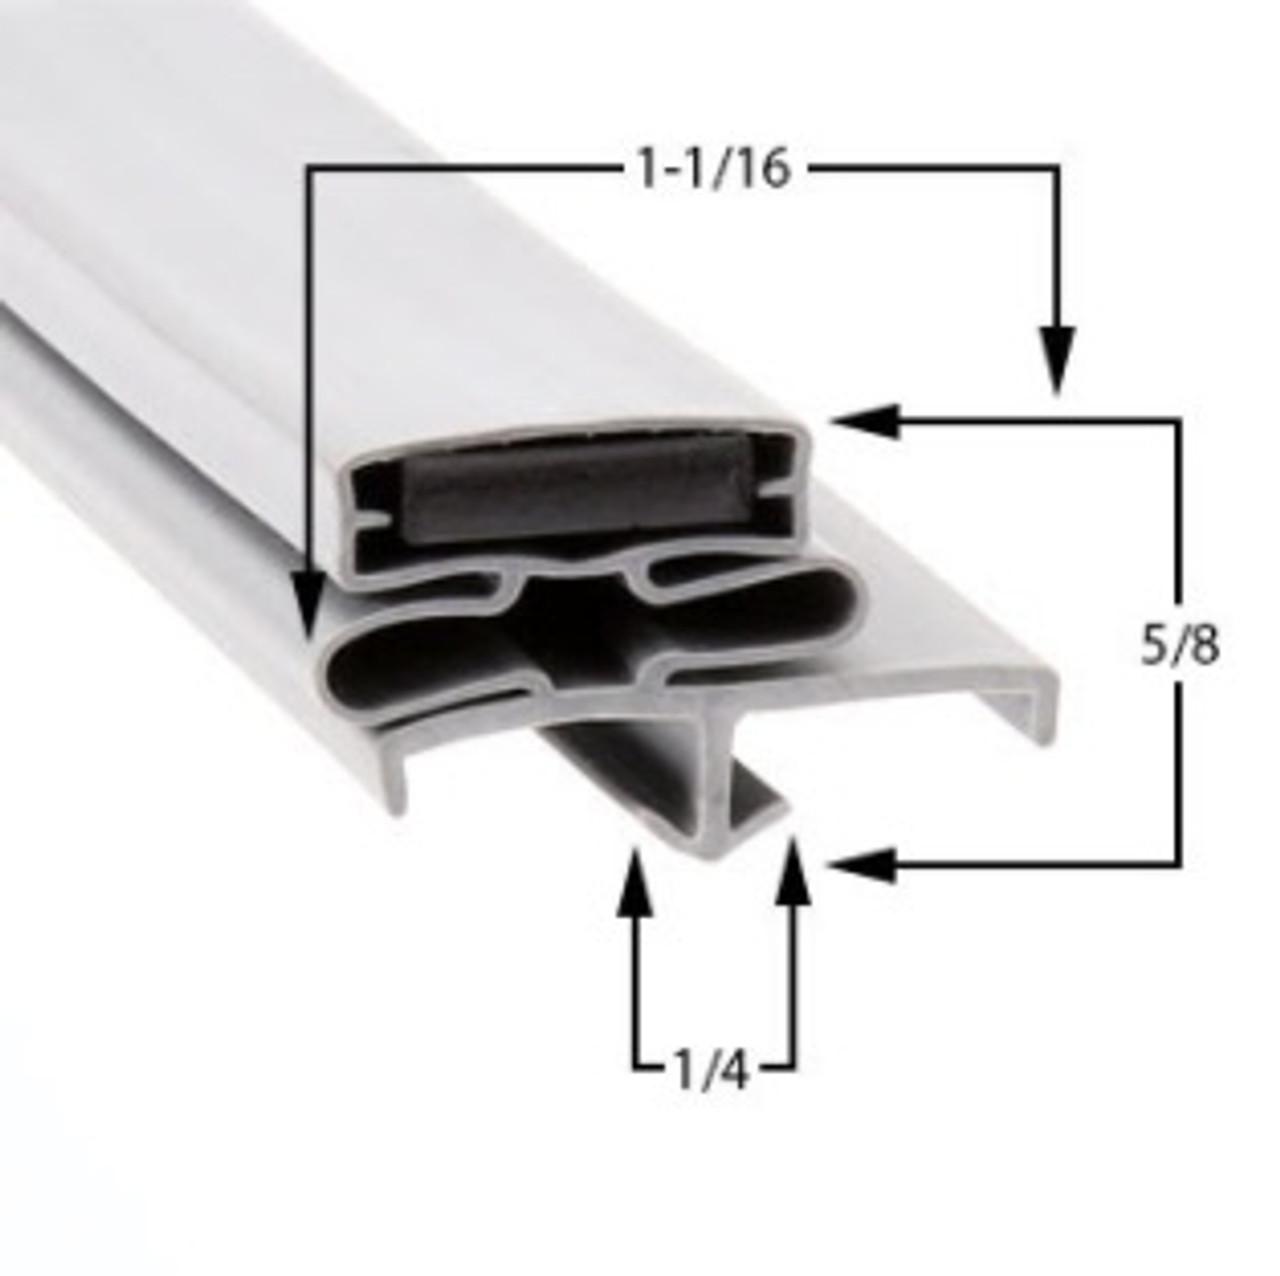 Delfield Door Gasket Profile 168 22 7/8 x 59 1/4 -A2.0881, 170-2295-C-2